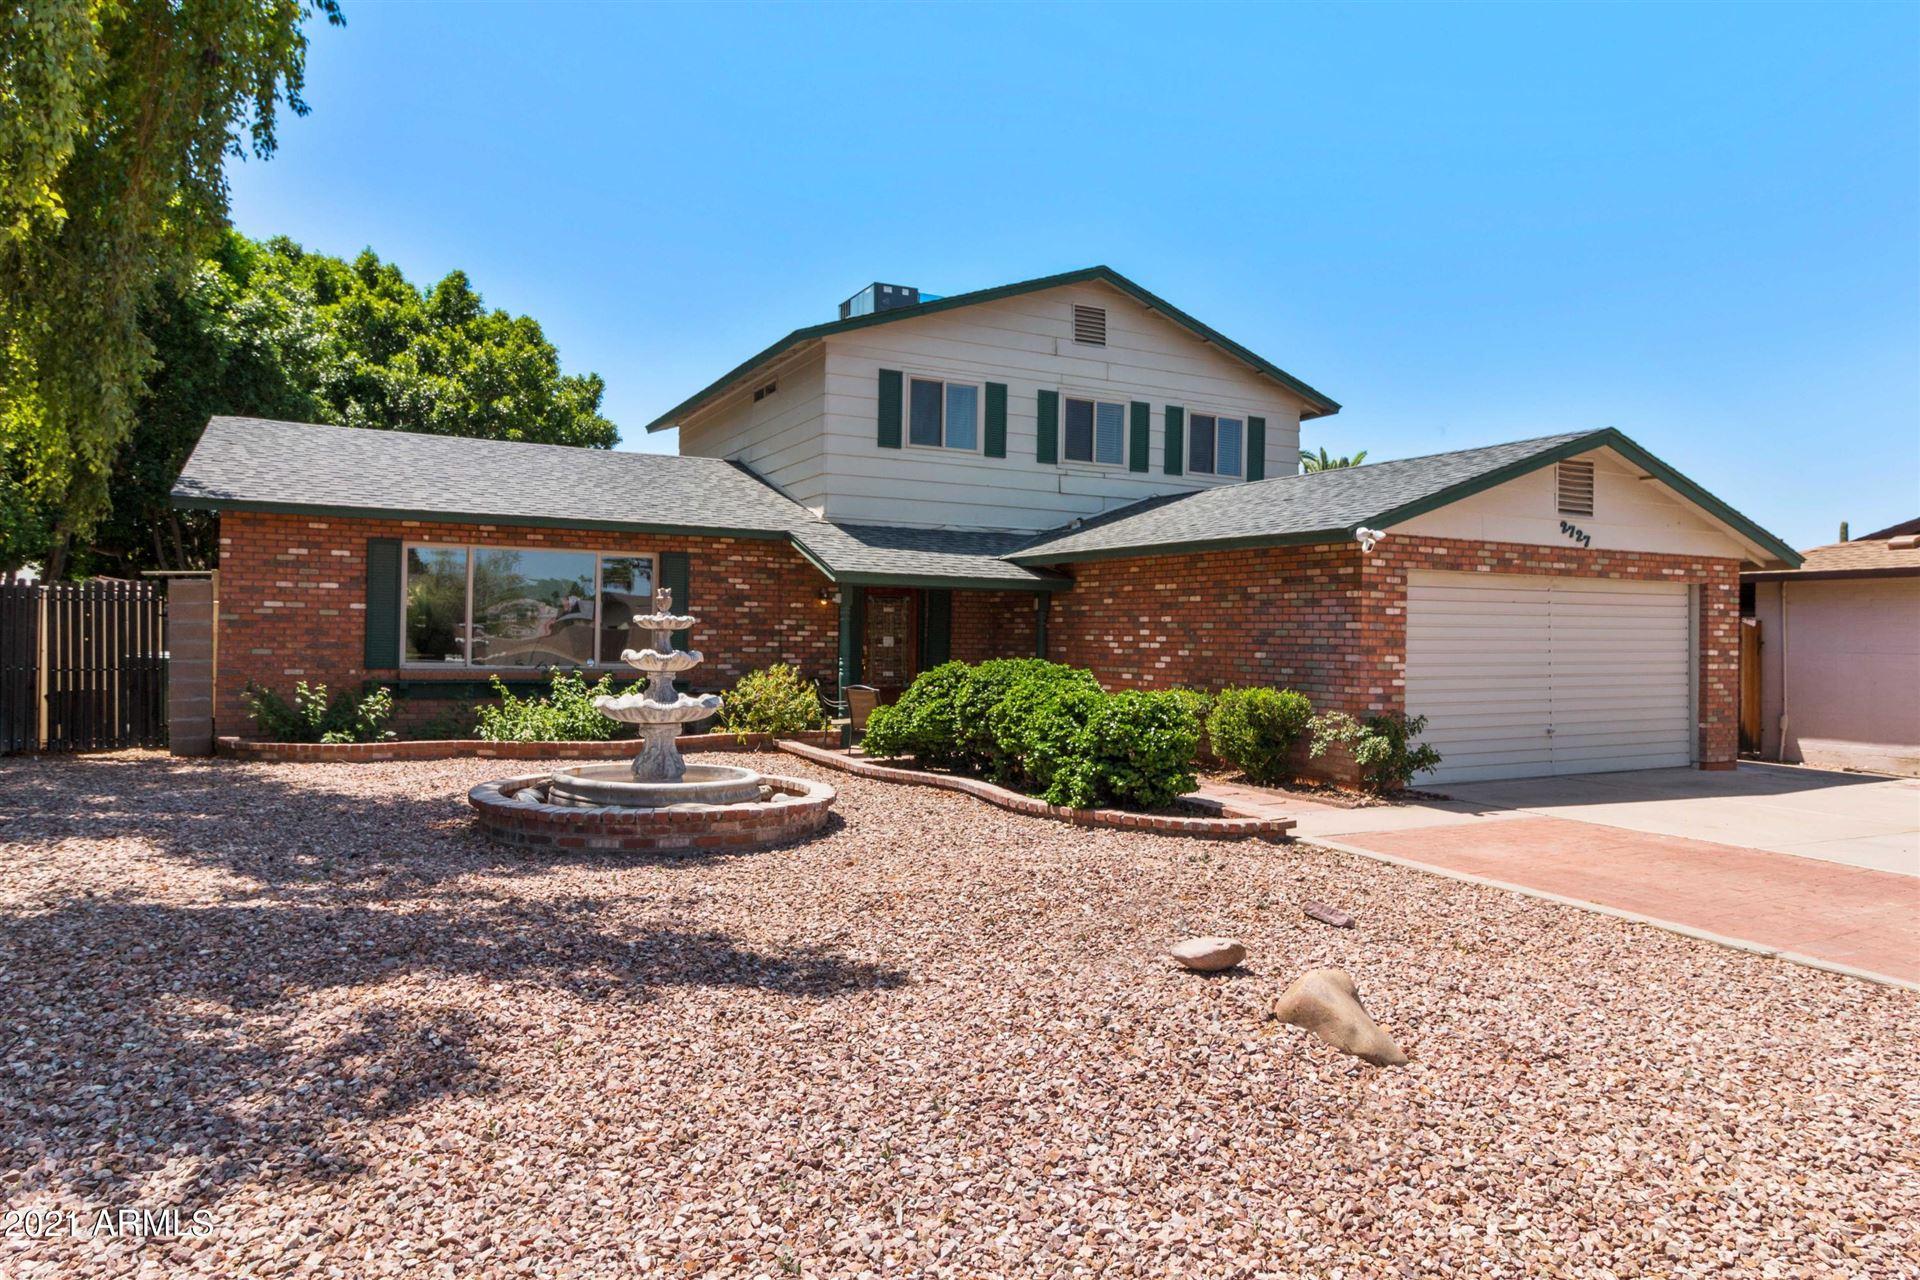 2727 W NATAL Circle, Mesa, AZ 85202 - MLS#: 6232191